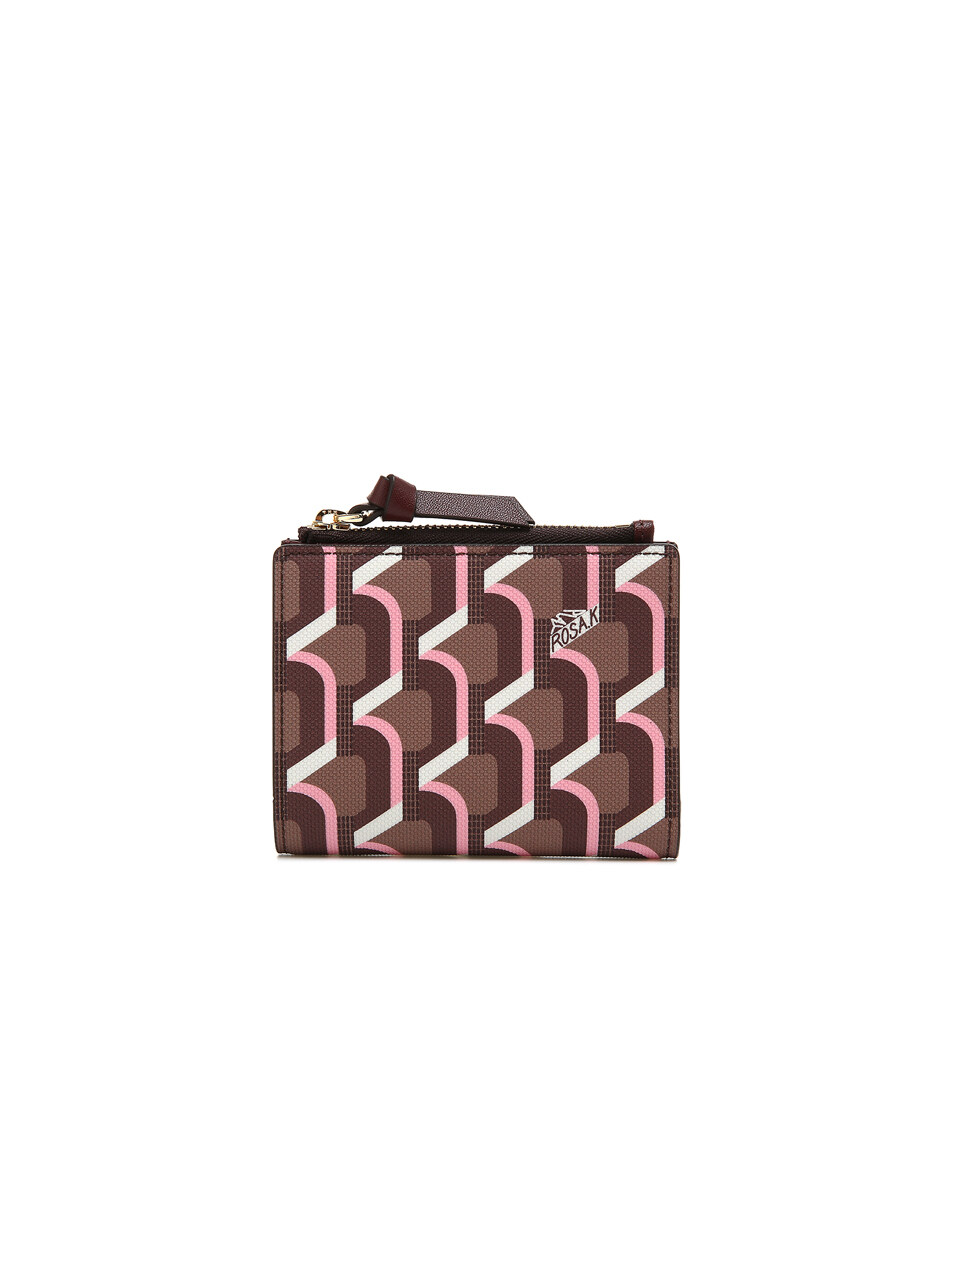 Monogram Bi-Fold Wallet - Rose Cognac